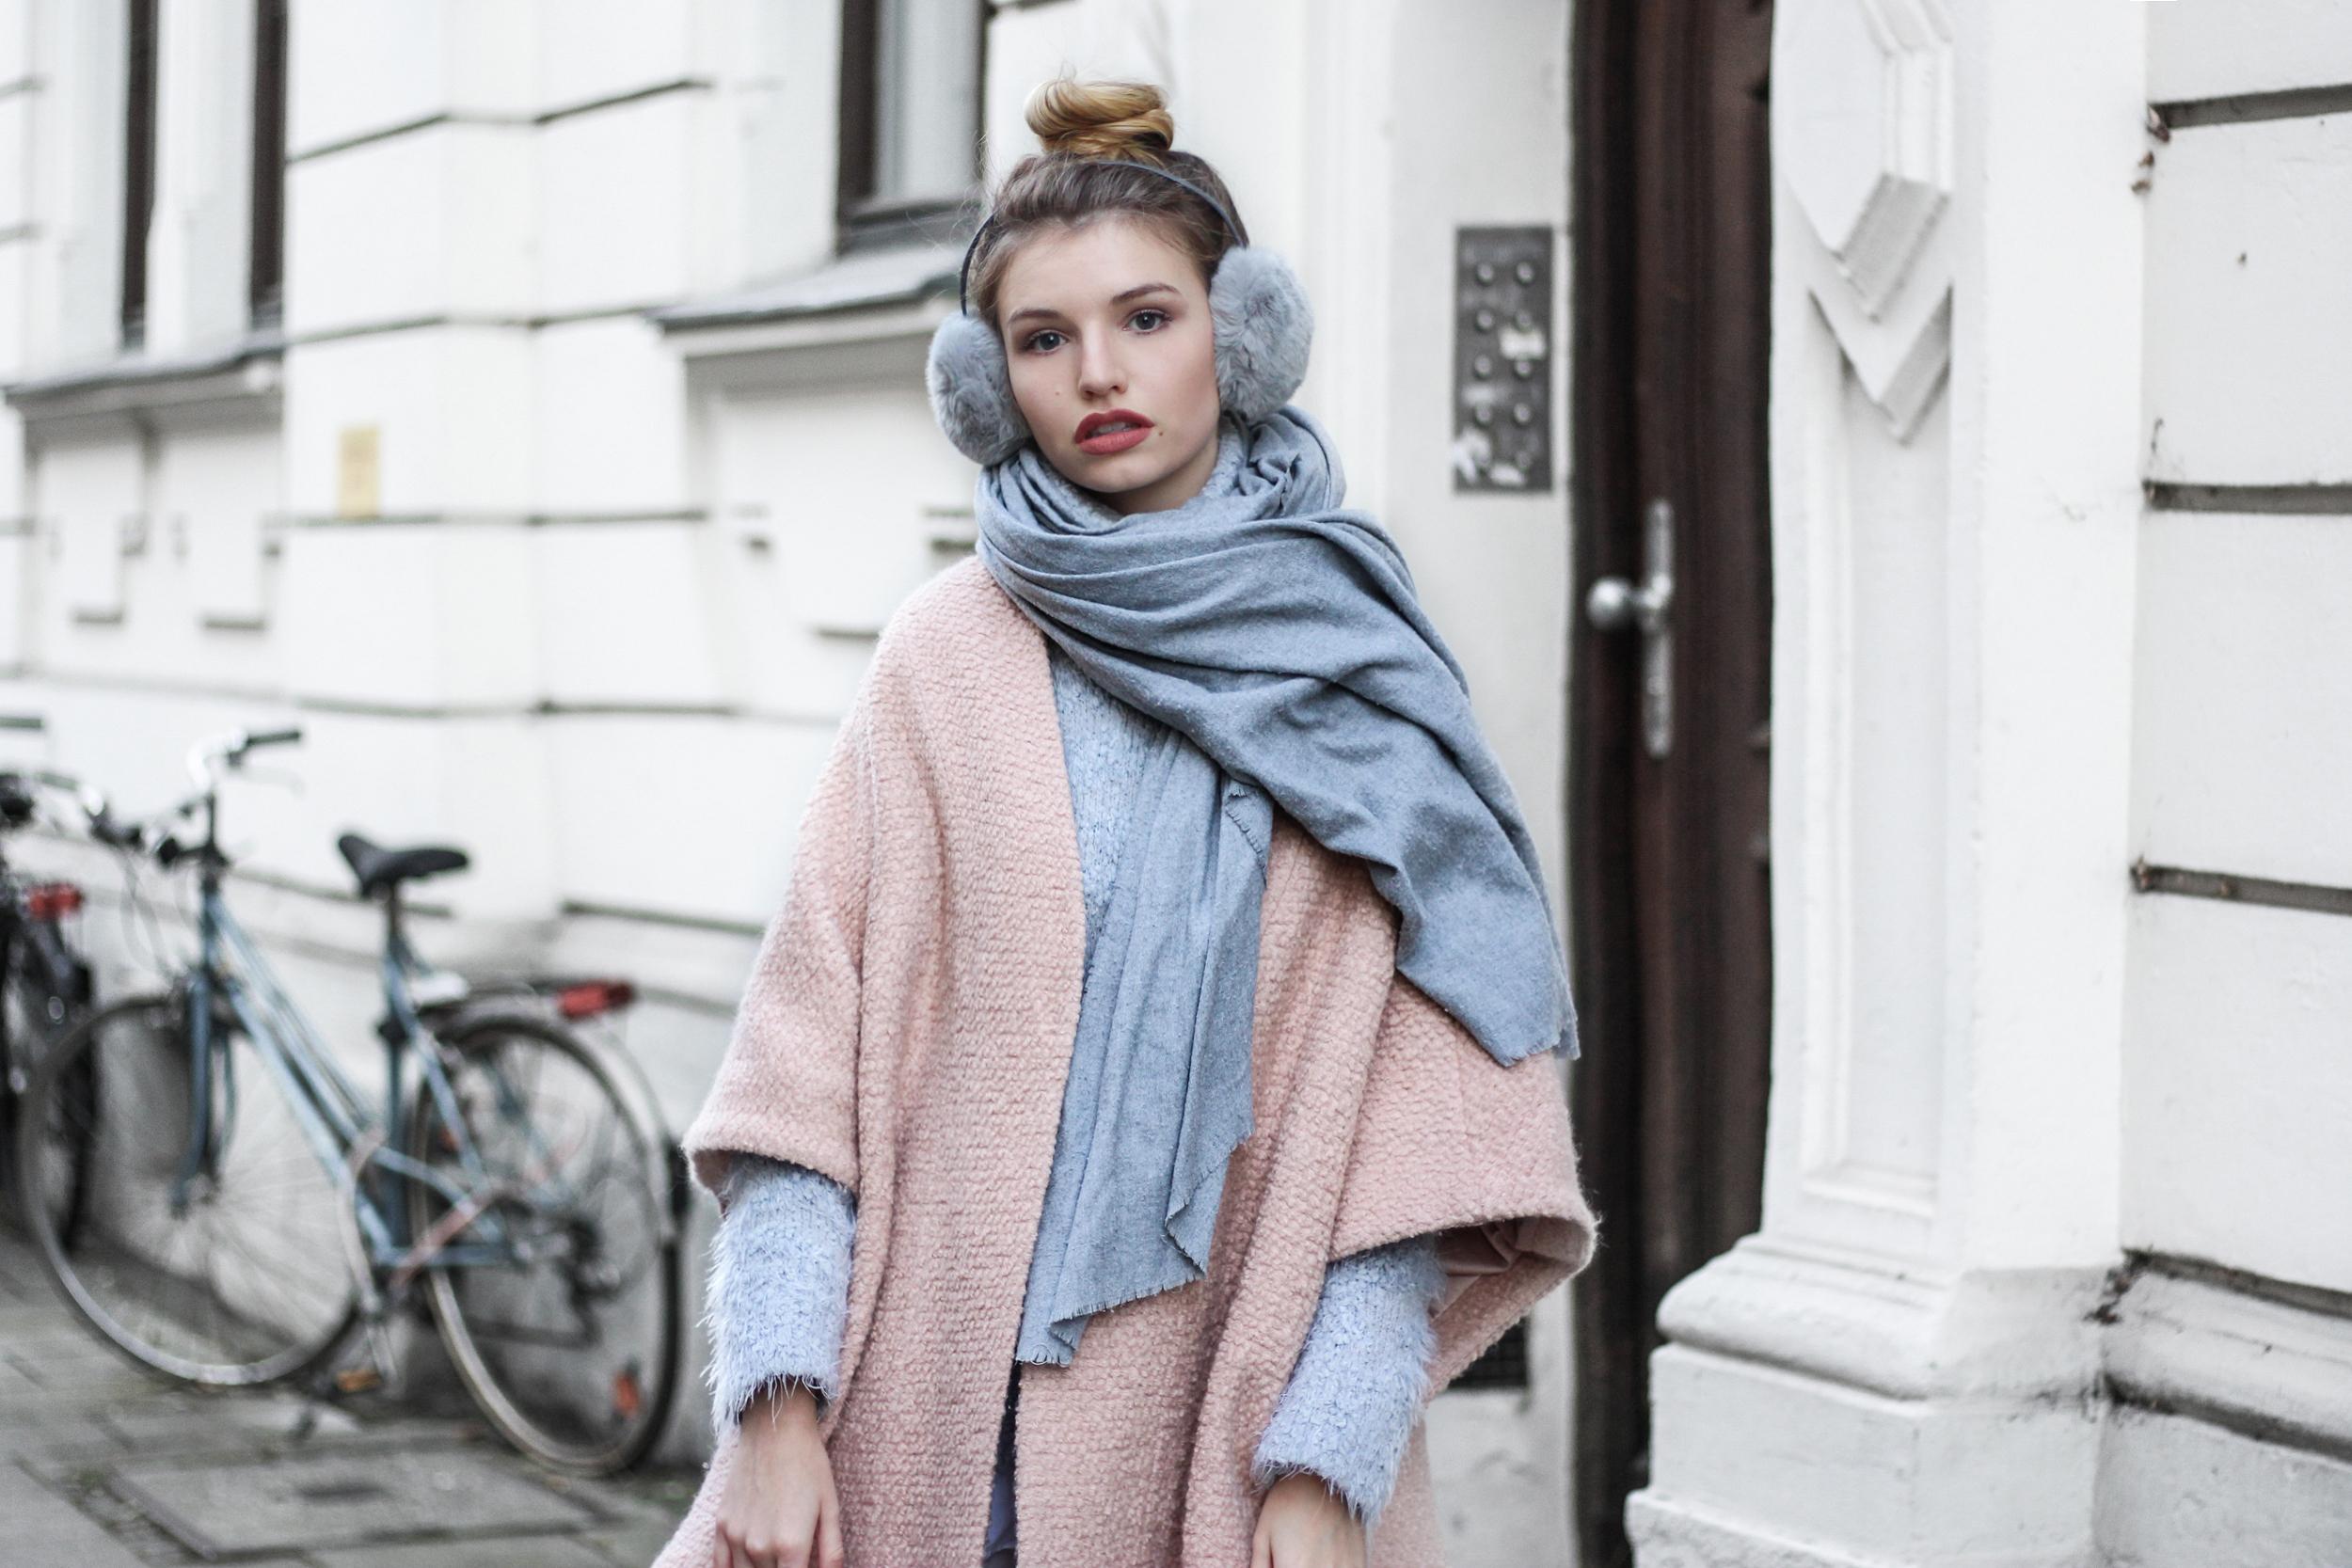 franziska-elea-blogger-aus-muenchen-fashionblog-rosa-mantel-pastell-puderfarben-herbst-winter-trend-2016-ohrenwaermer-ohrwaermer-lagenlook-streetstyle